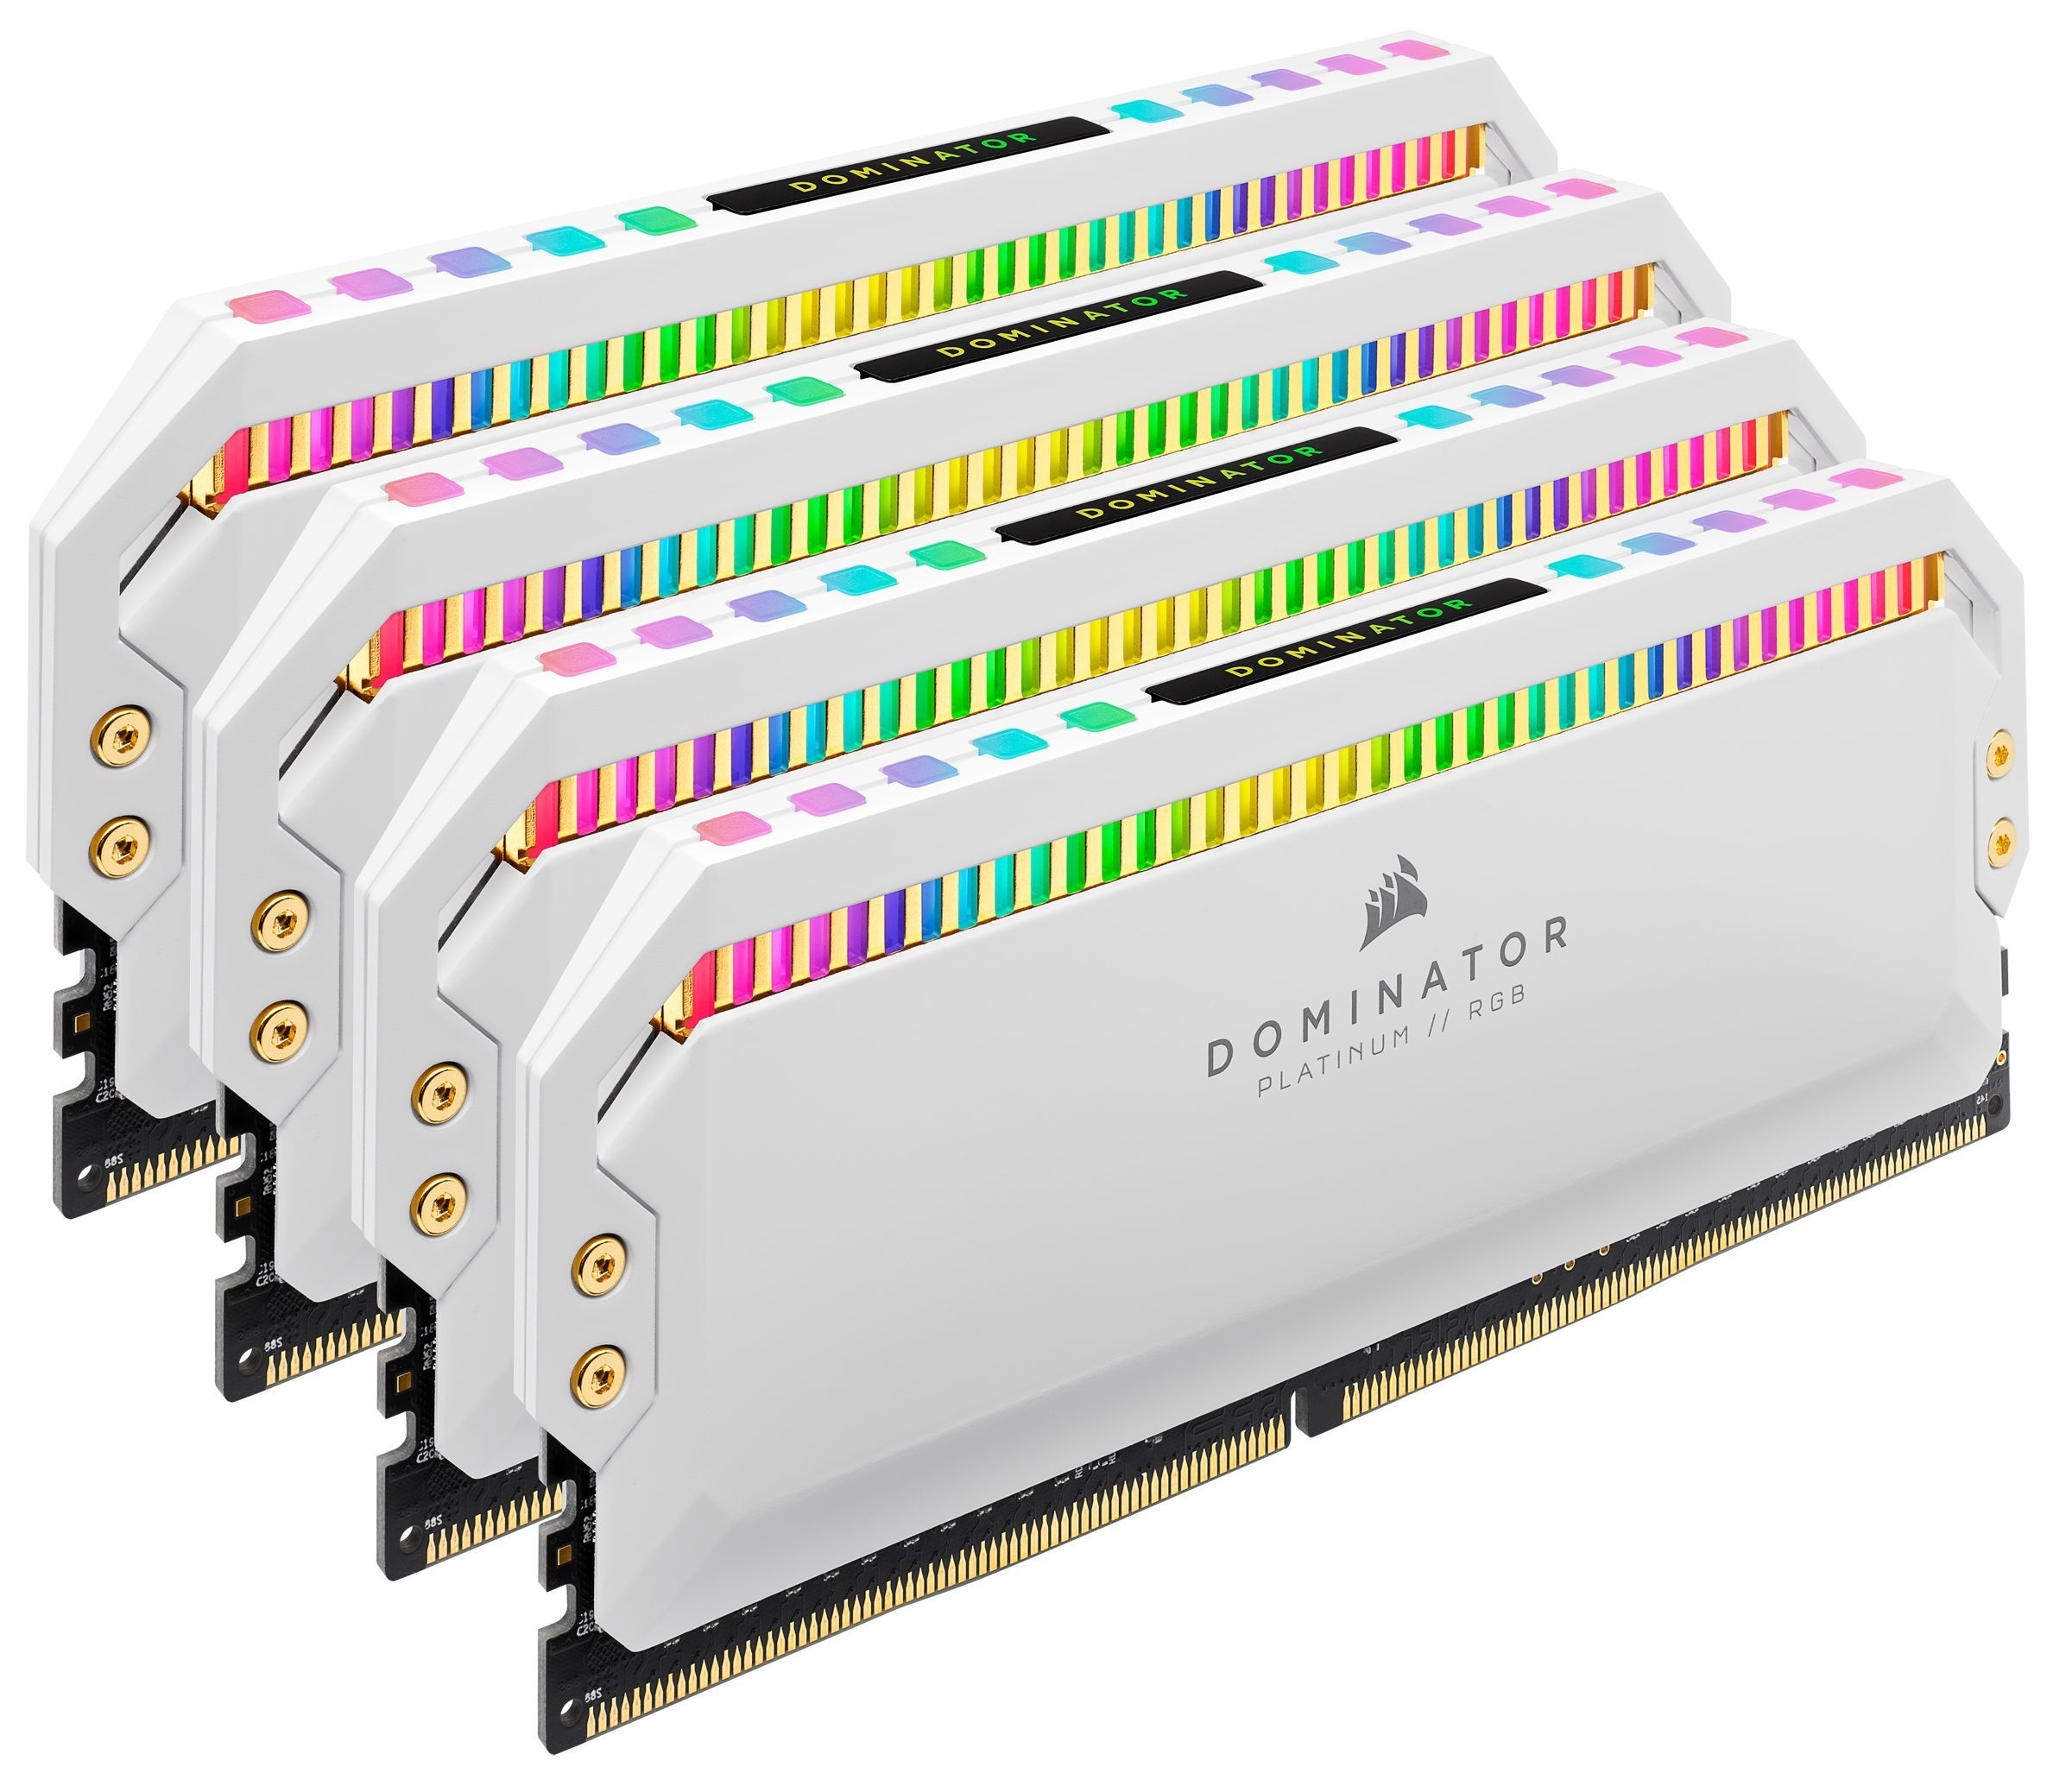 Dominator Platinum - 4 x 8 Go - DDR4 3600 MHz - RGB - Blanc